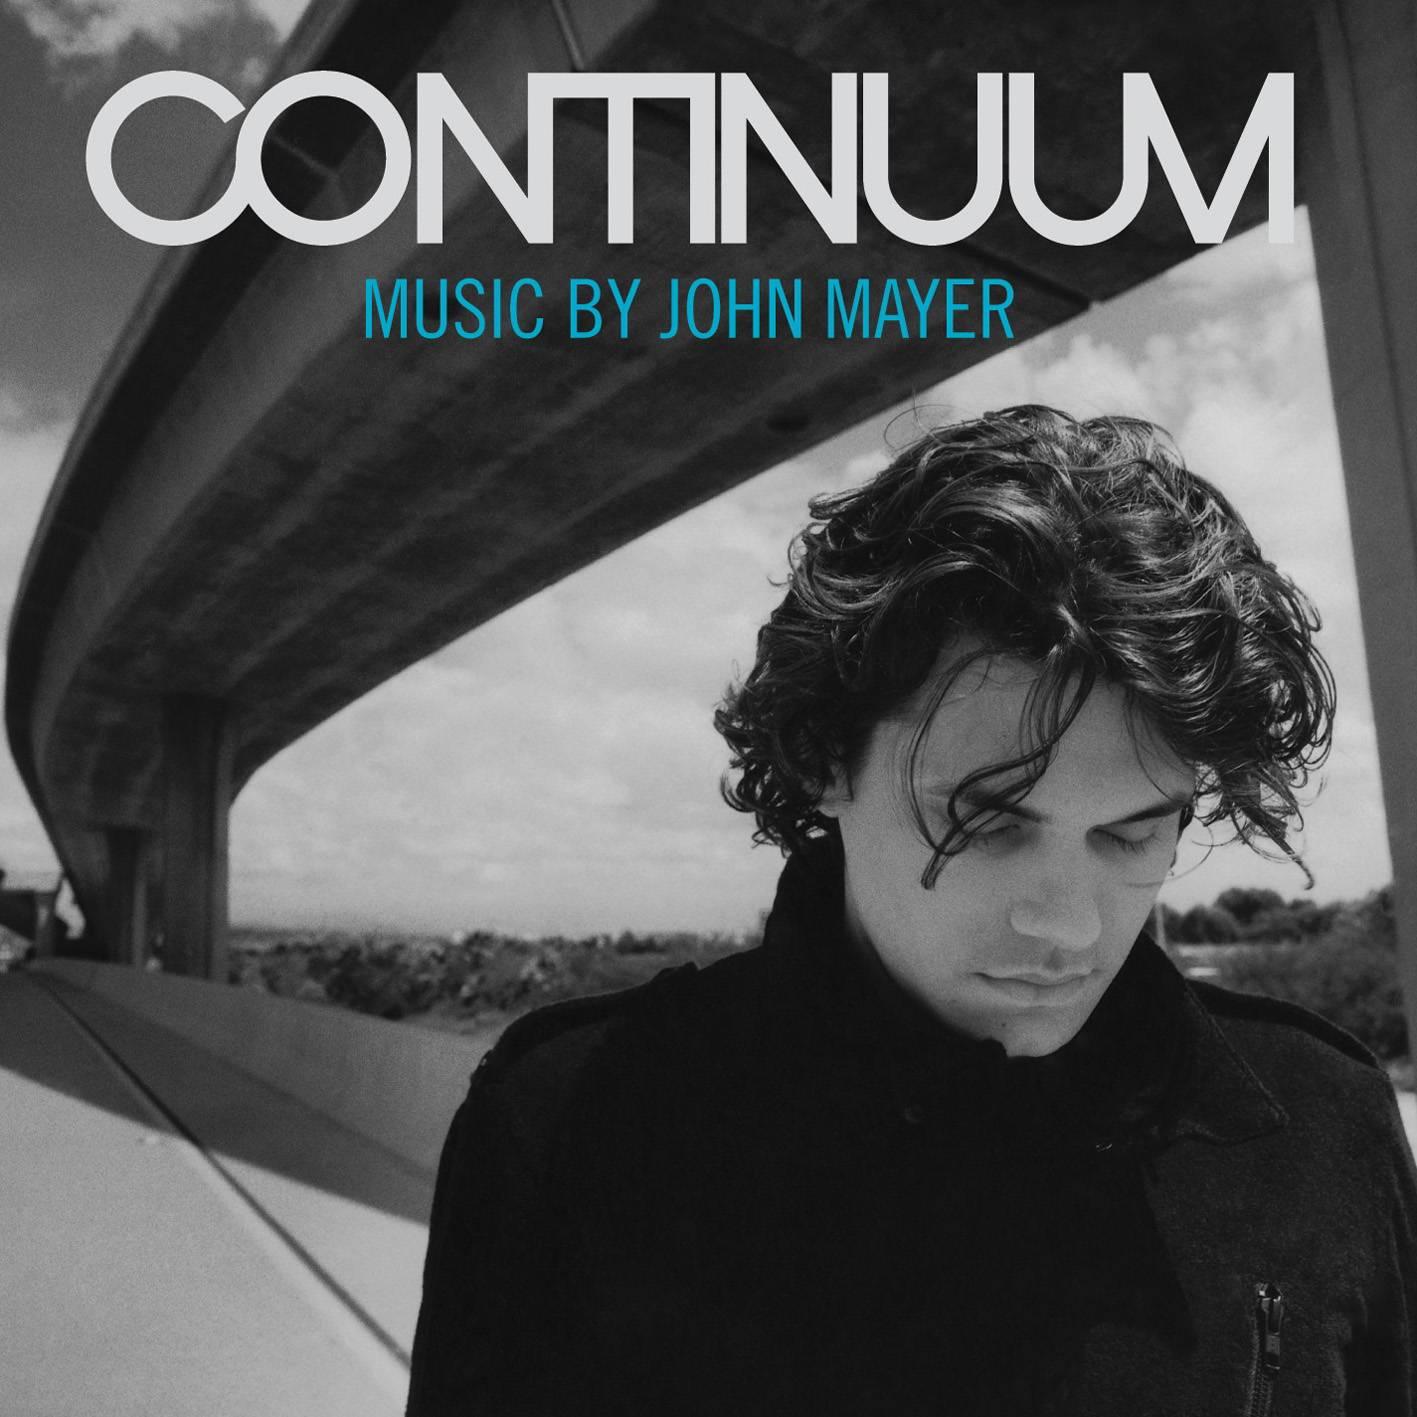 John Mayer - Continuum (2006/2016) [Official Digital Download 24-bit/96kHz]